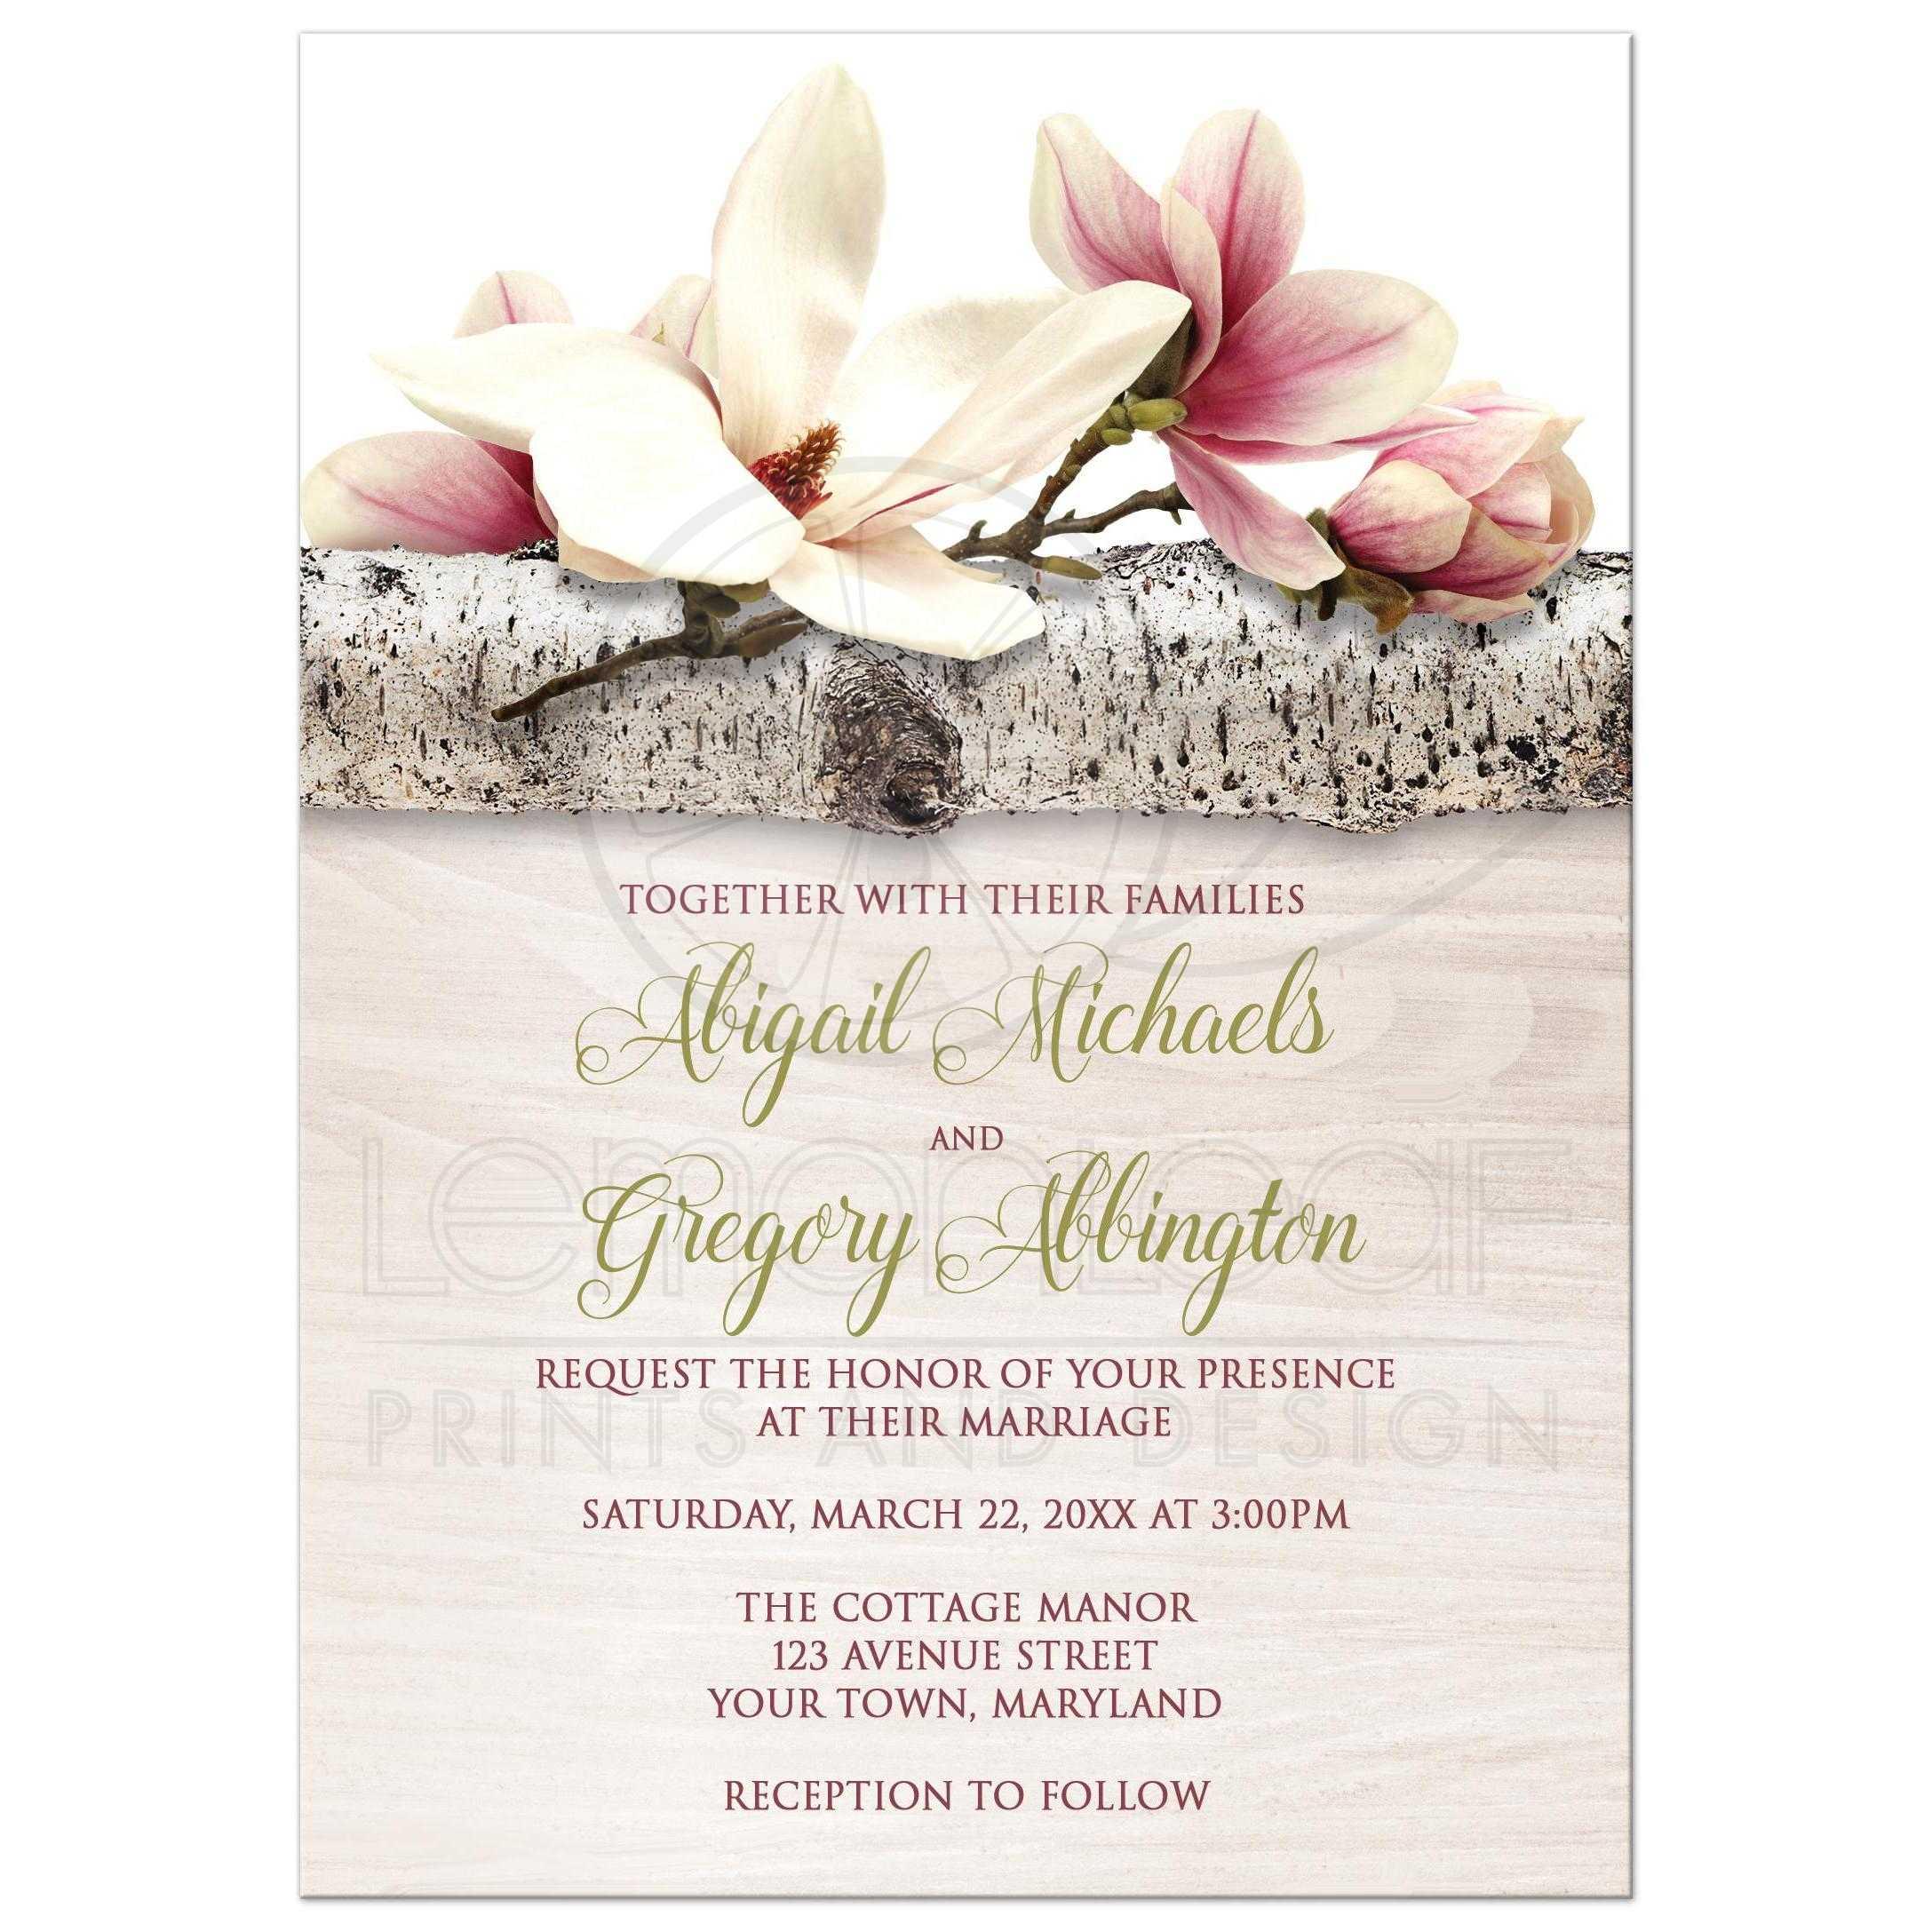 44139rectanglemagnoliabirchlightwoodfloralweddinginvitationst1460646160: Rustic Wood Floral Wedding Invitations At Reisefeber.org